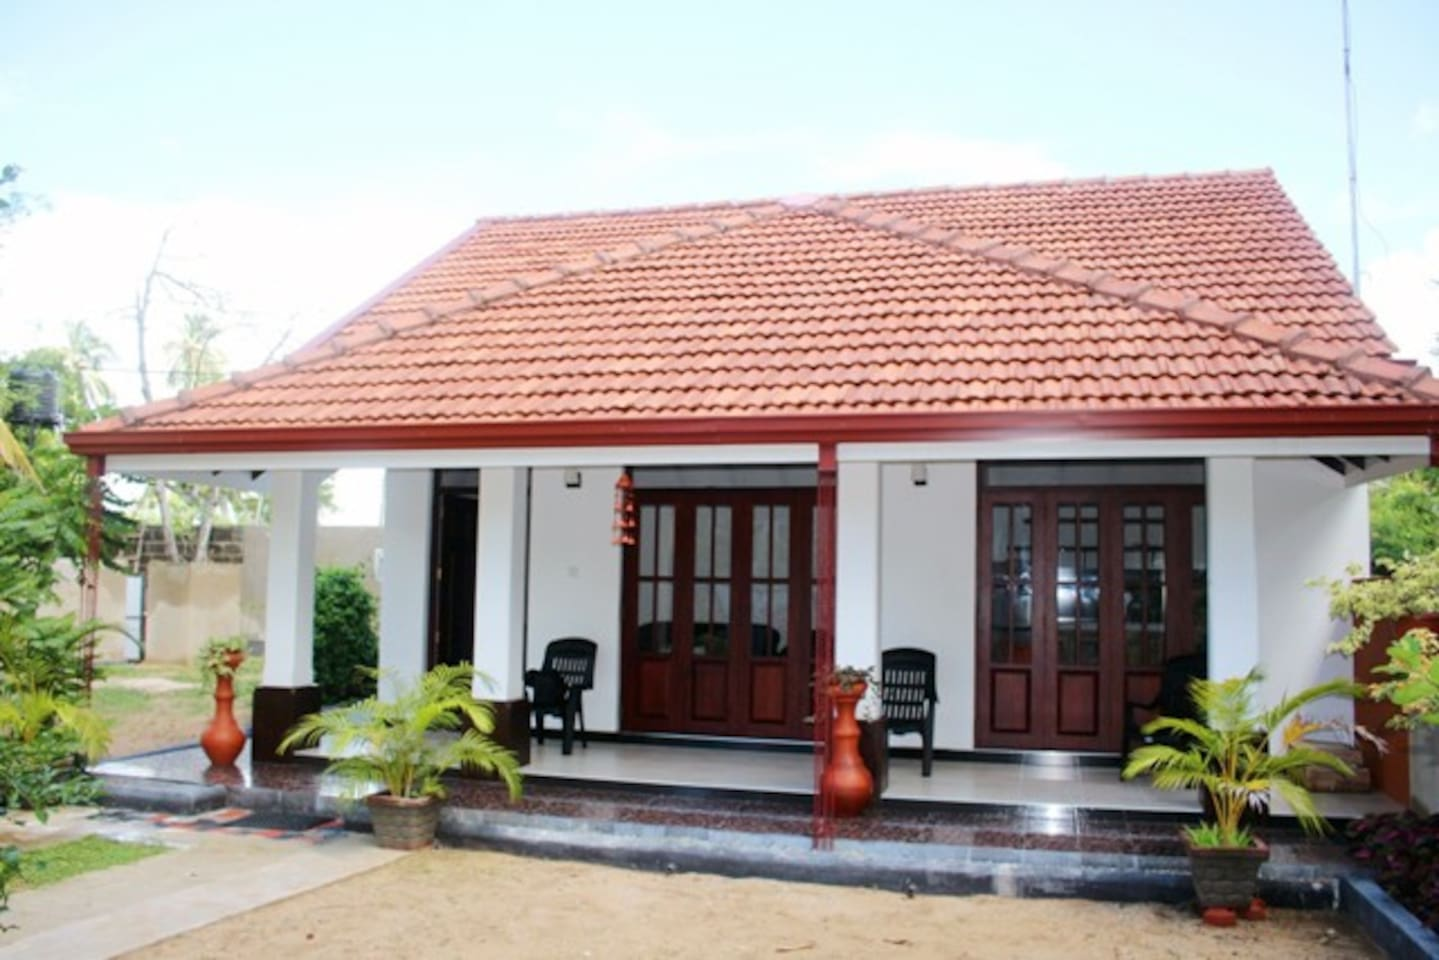 Beach house in Sri Lanka, Ceylon, Negombo. View from the garden - Vista dall'ingresso del giardino.